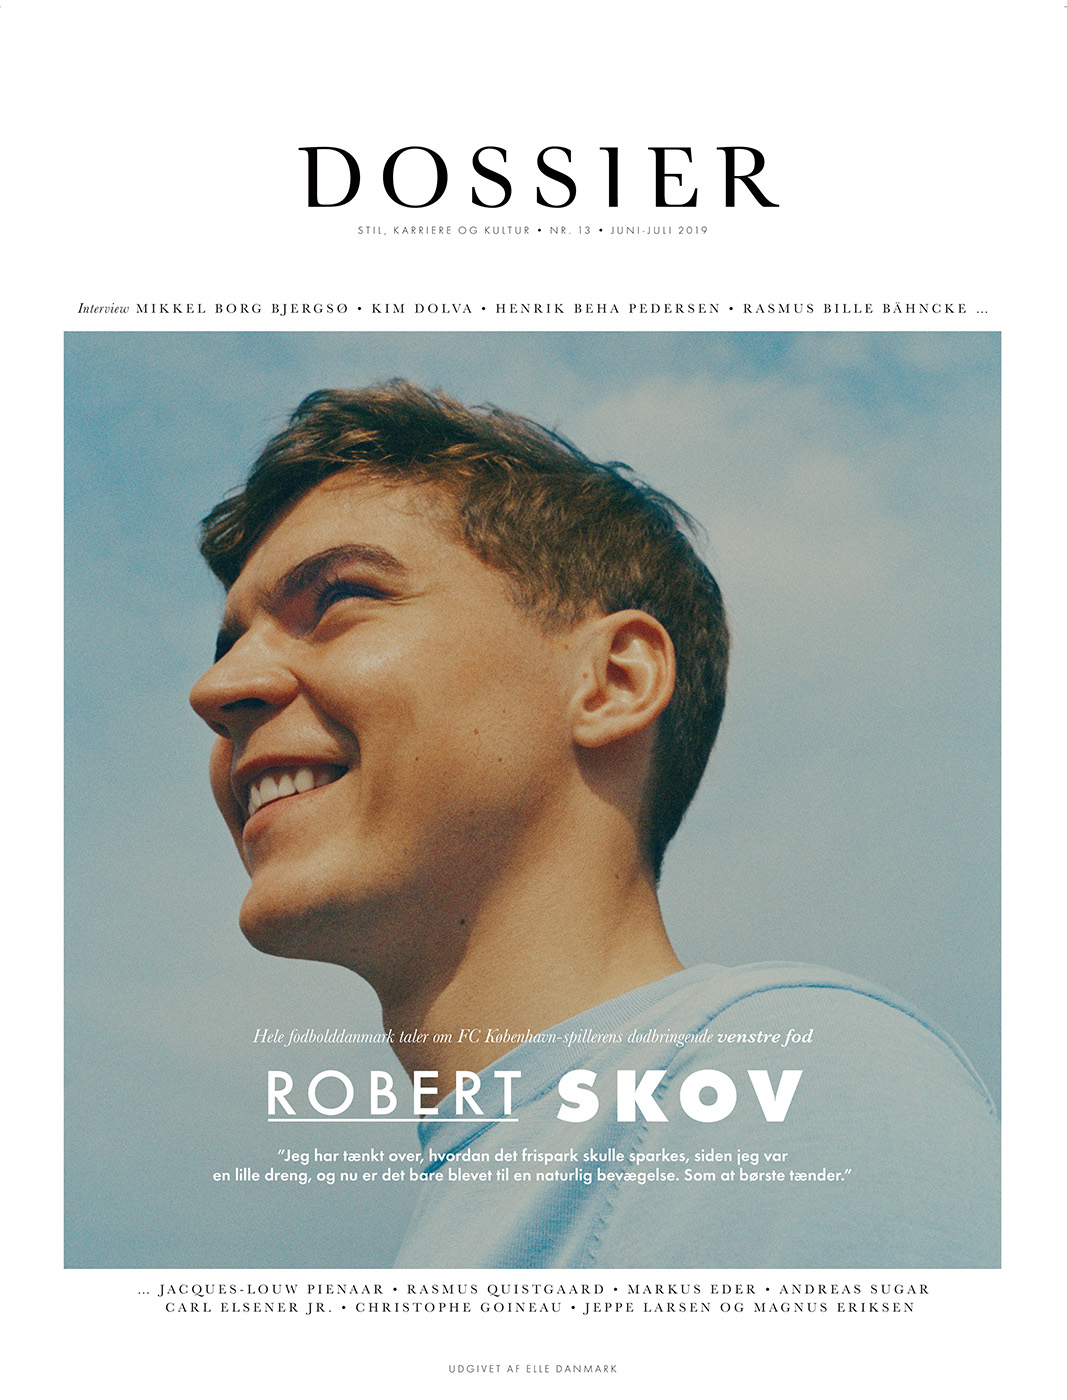 Robert Skov – dossier